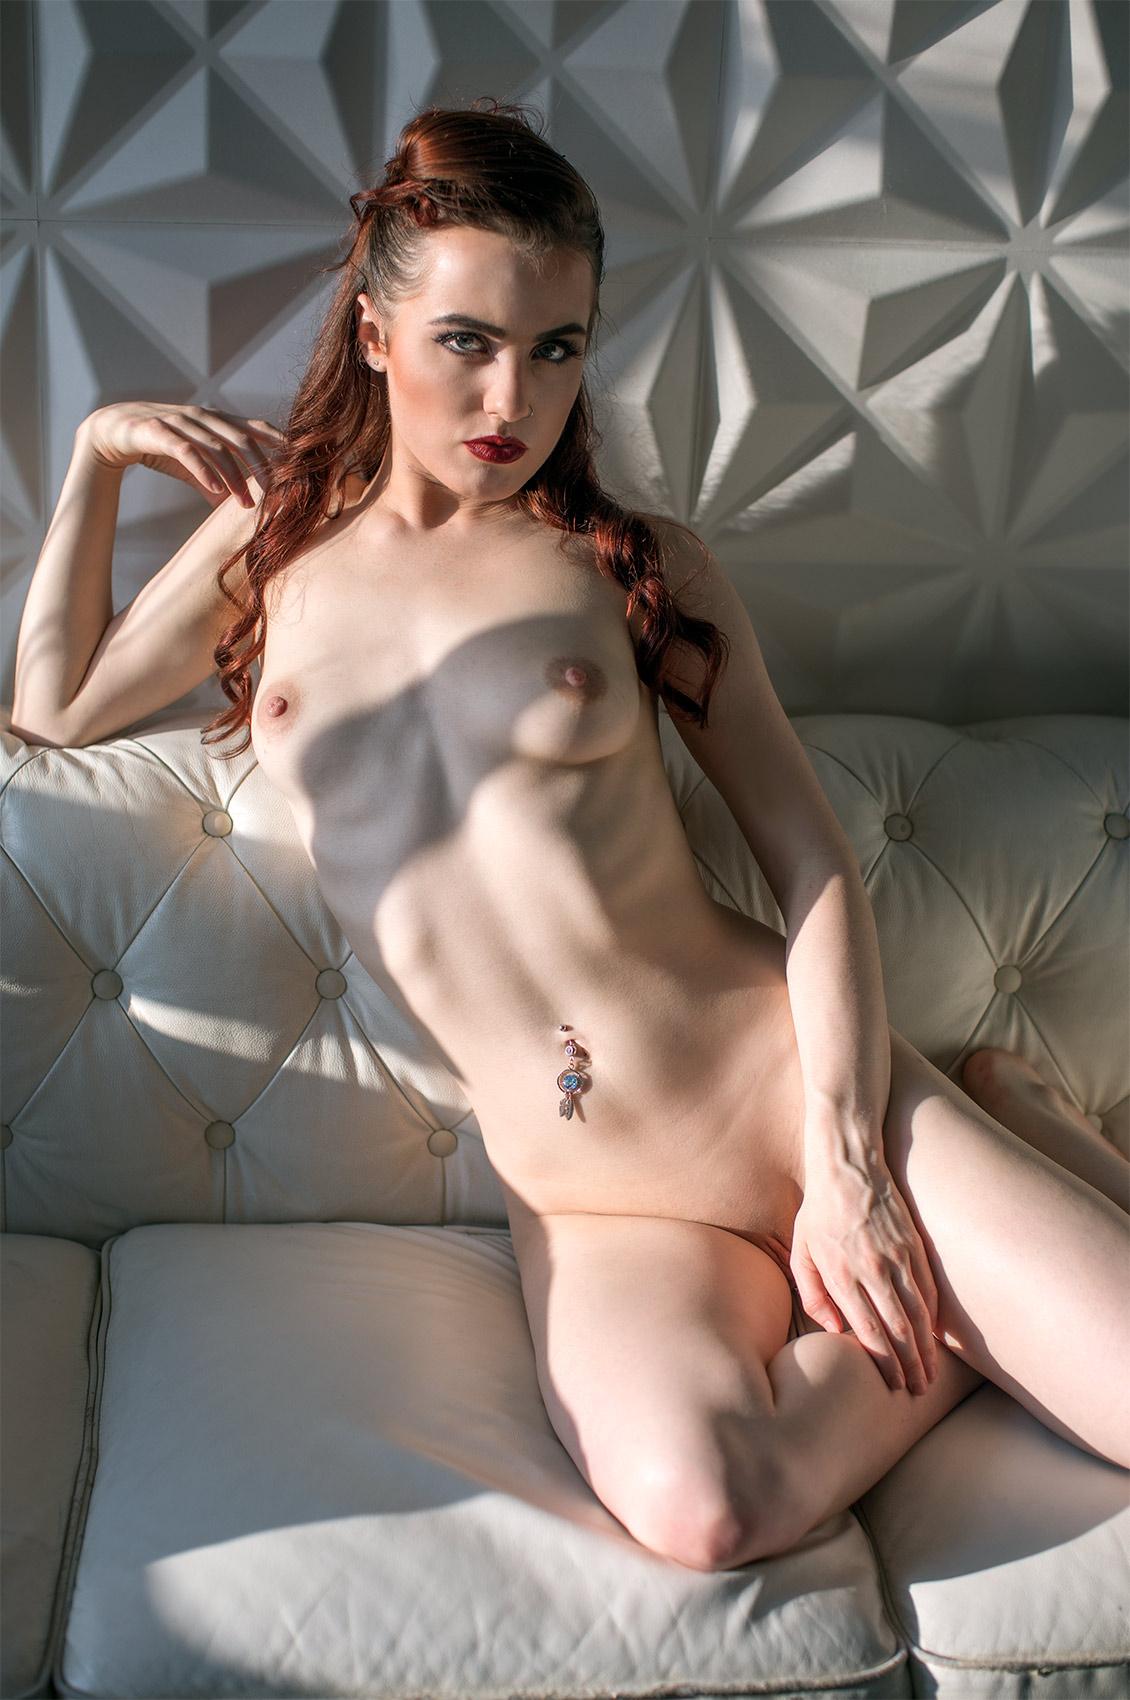 Lola Rae's VR Porn Videos, Bio & Free Nude Pics